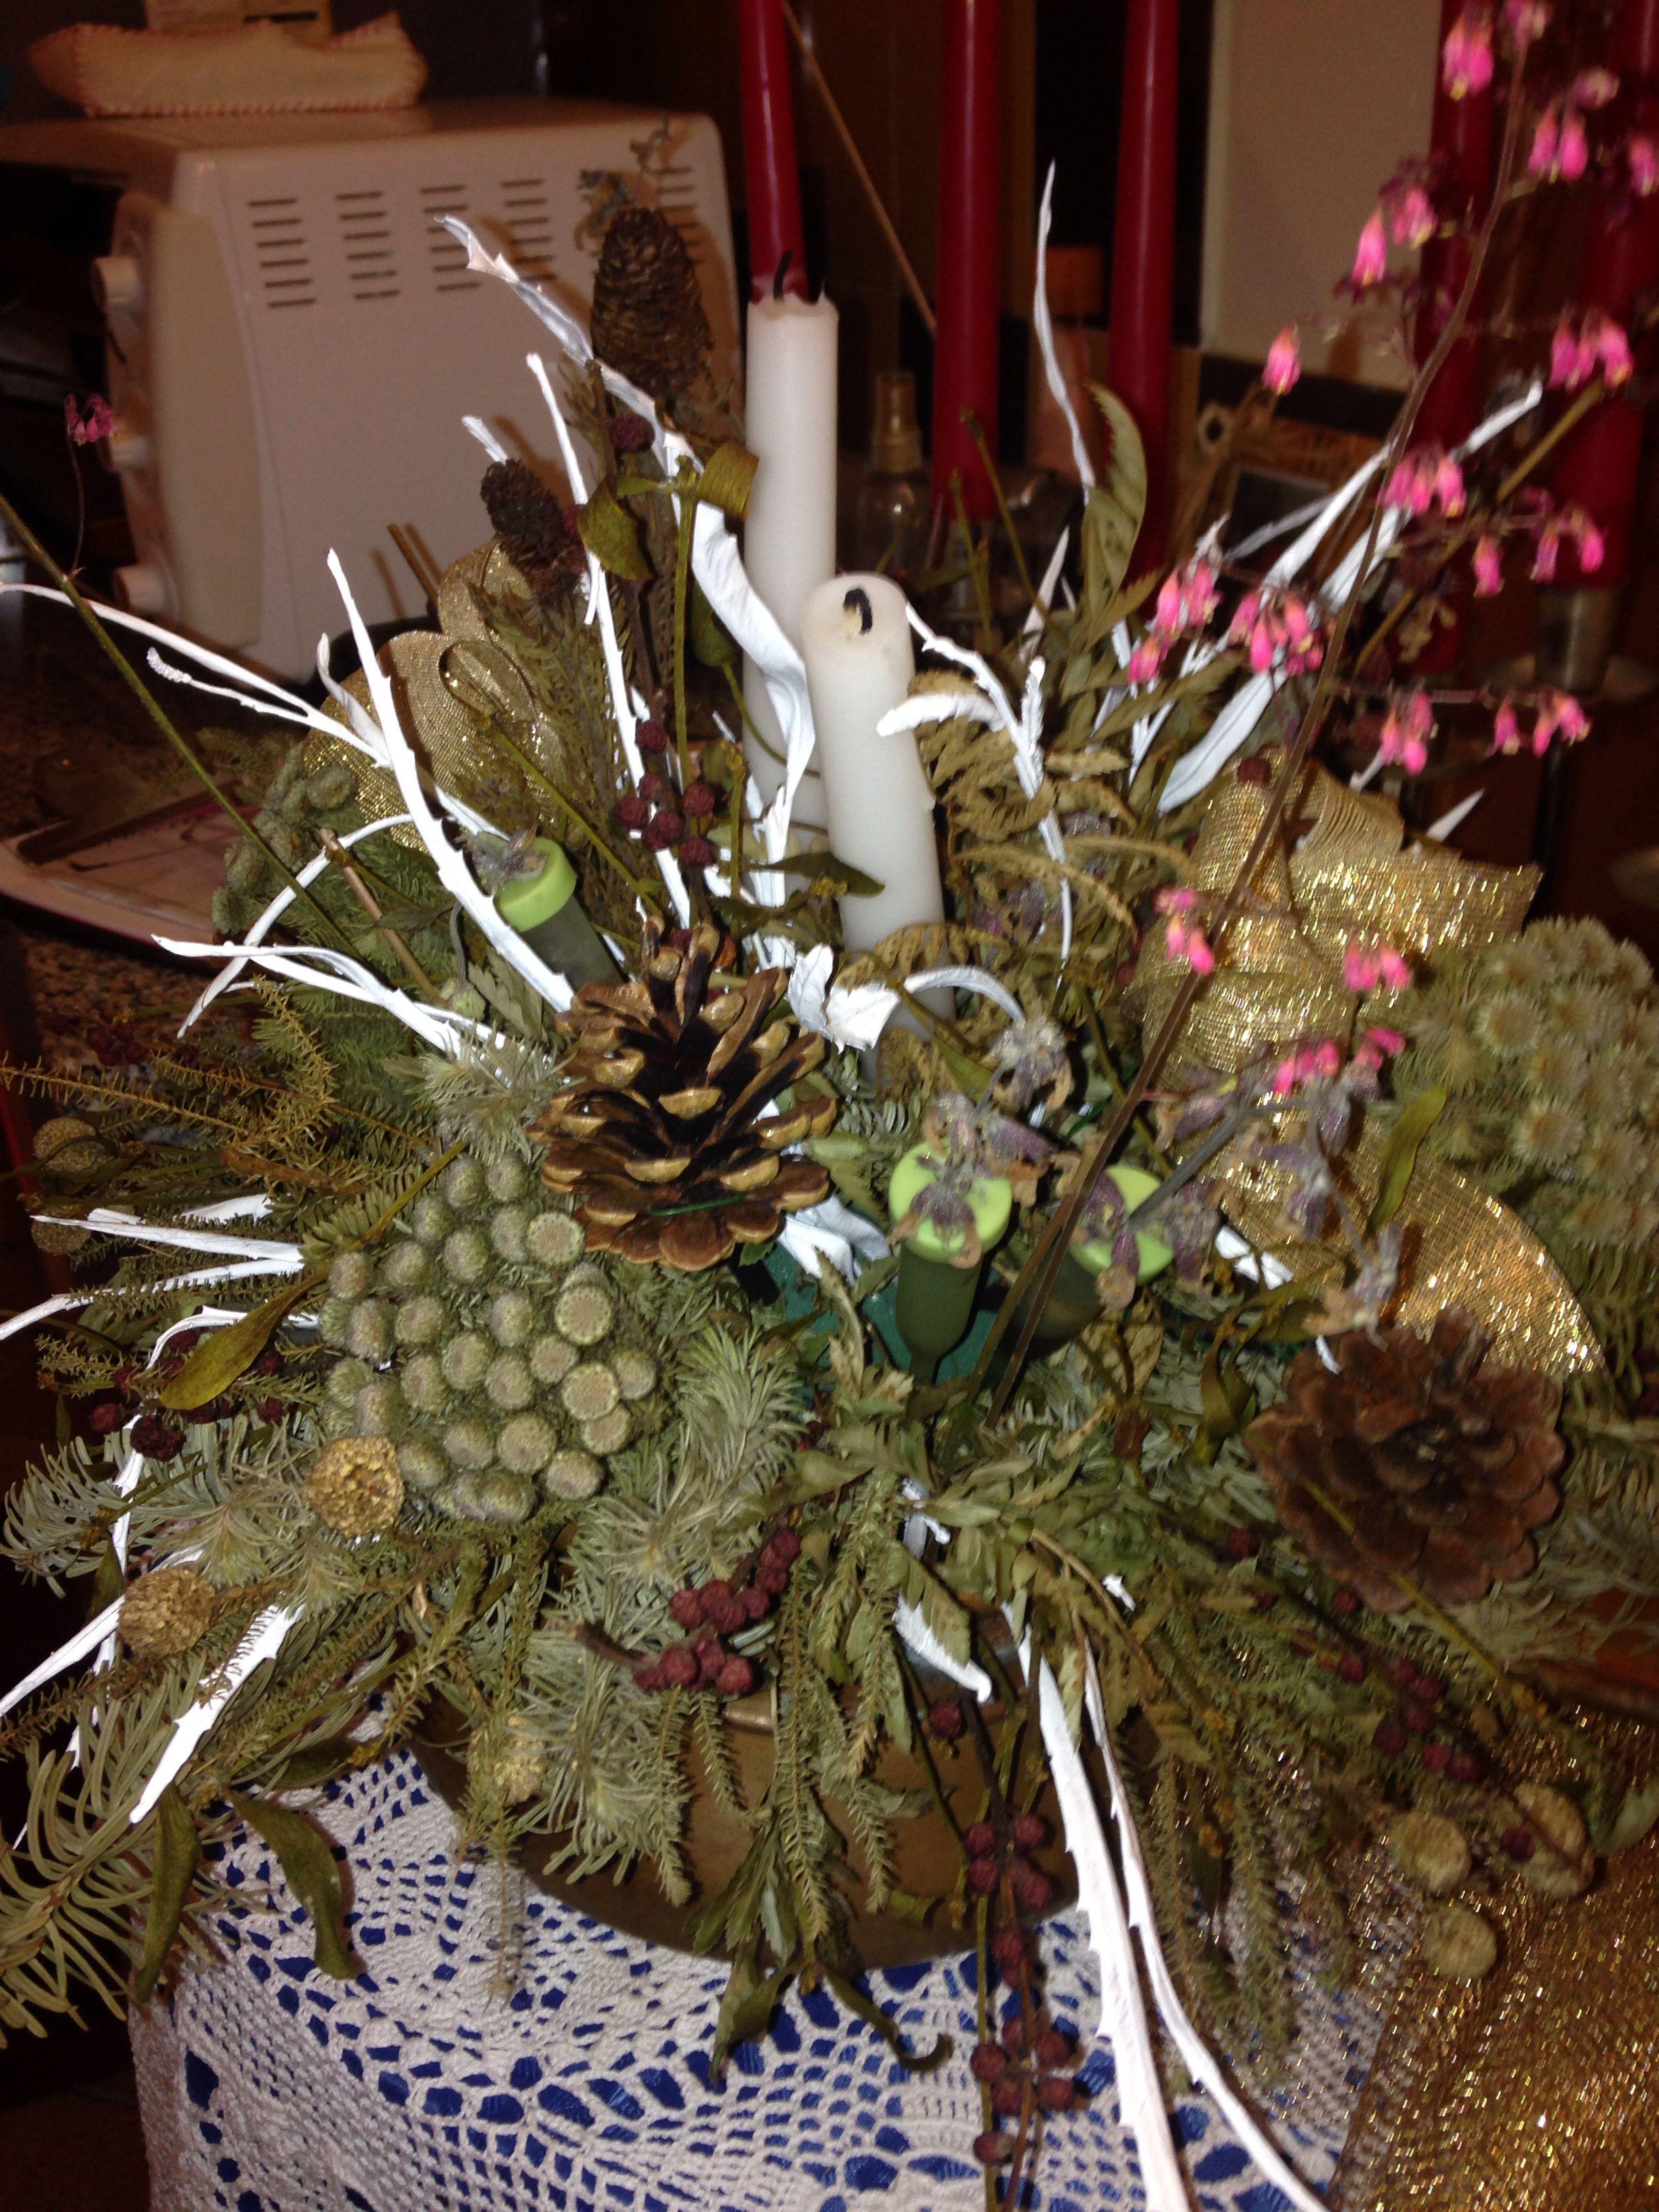 Season decoration for home!